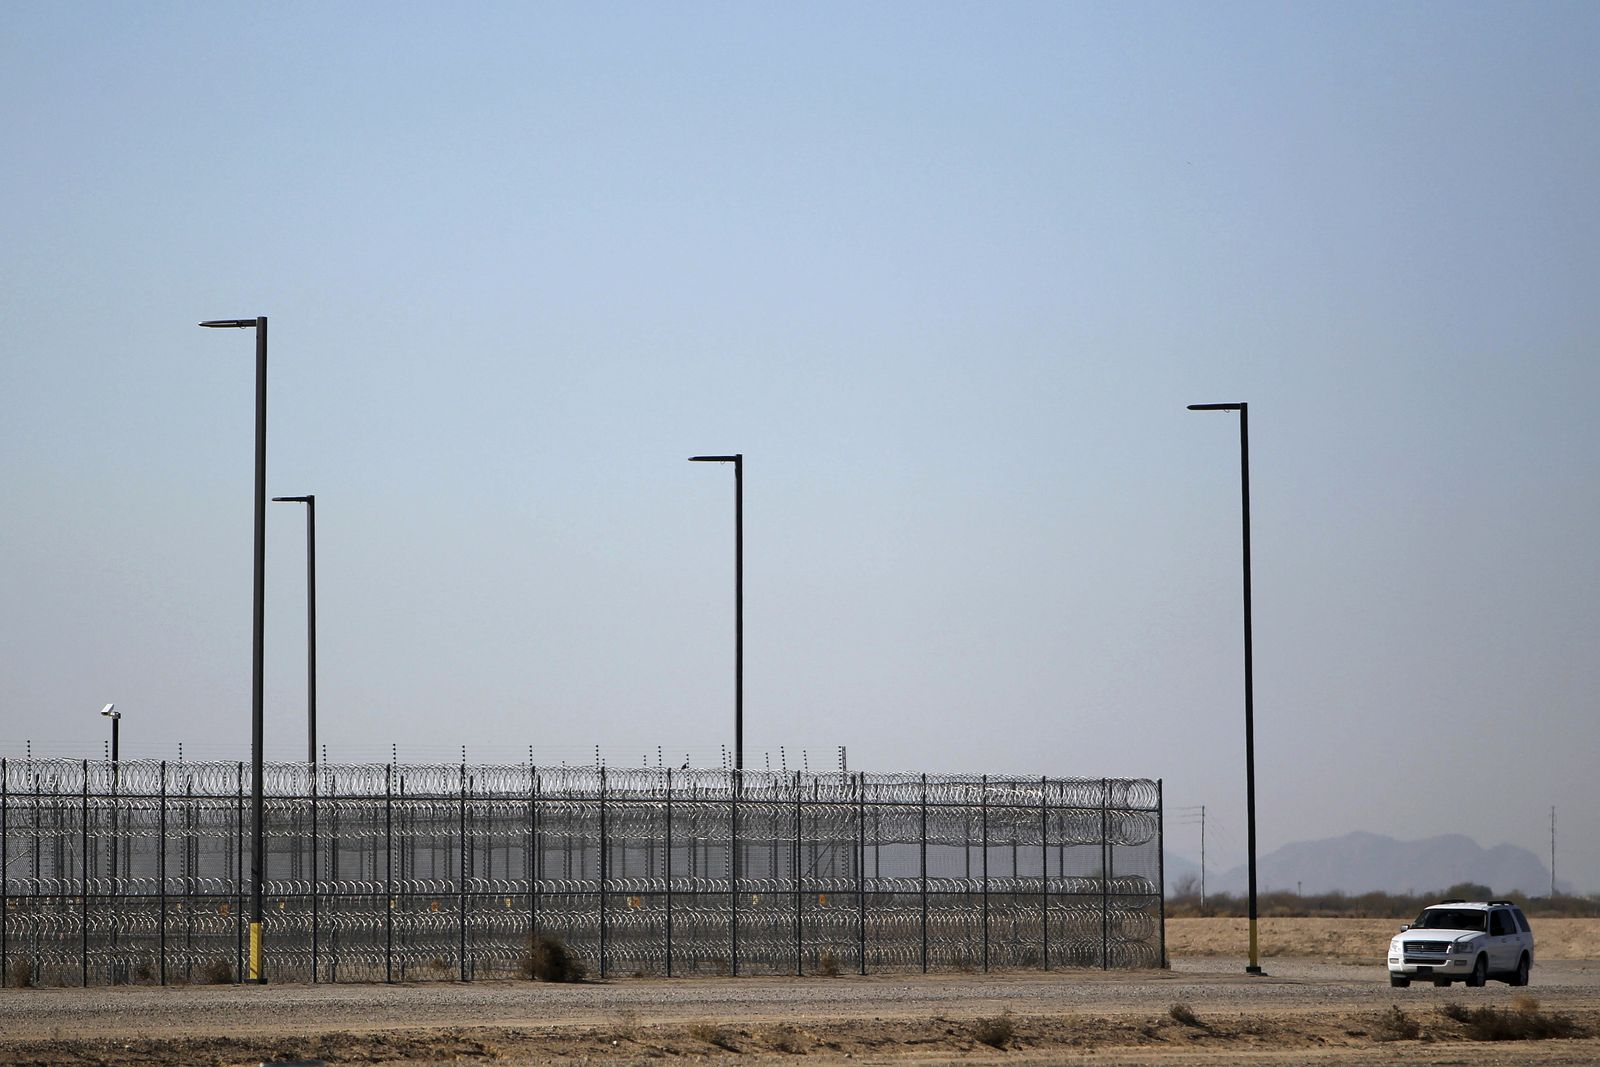 Privatgefängnis/ Eloy Detention Center